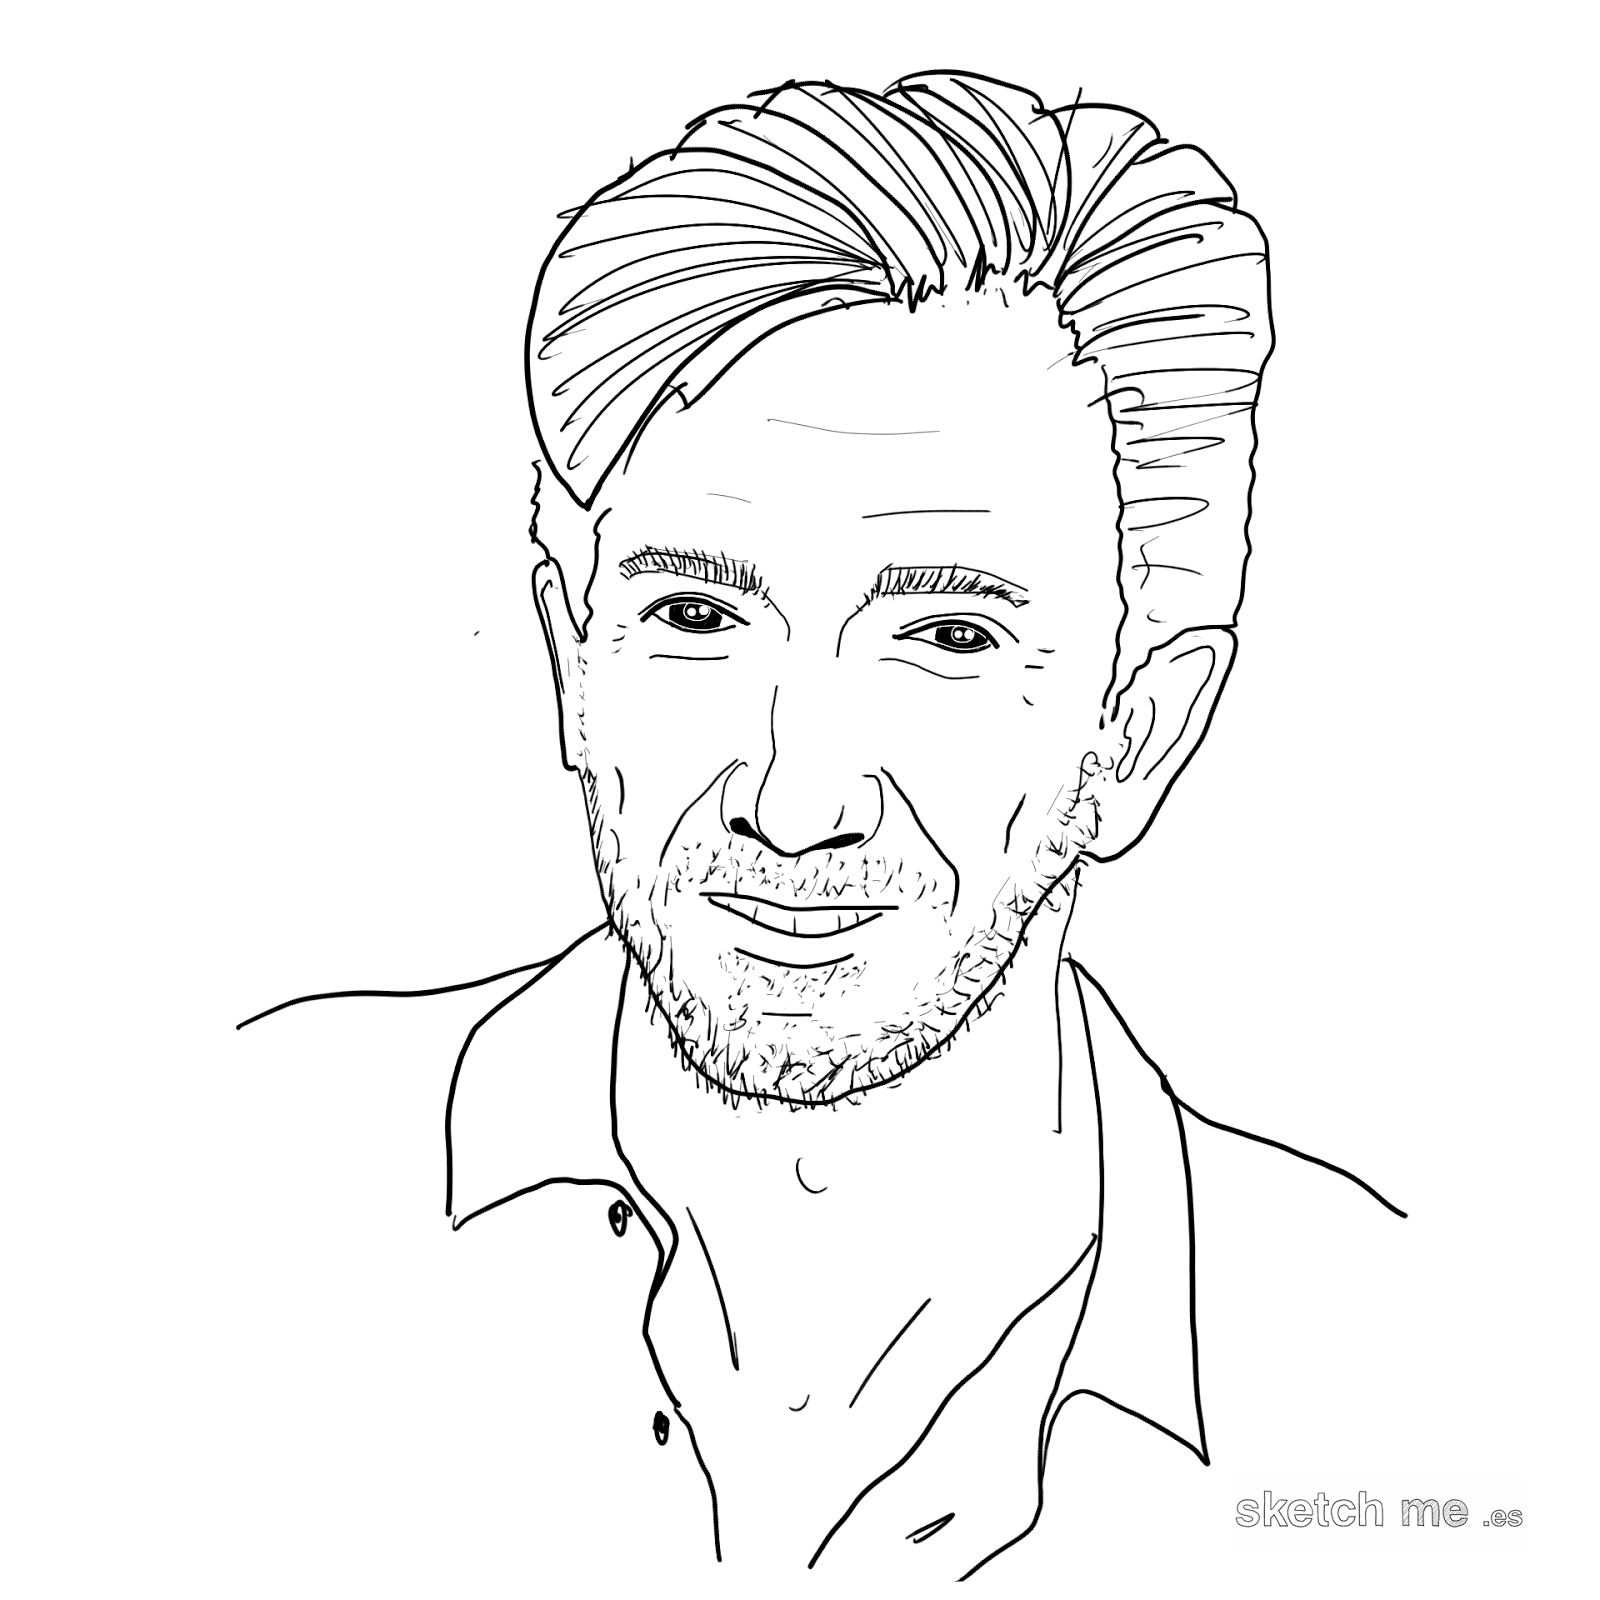 pablo-motos-sketch-me-retratos-personalizados-dibujados-a-mano-para-facebook-twitter-whatsapp